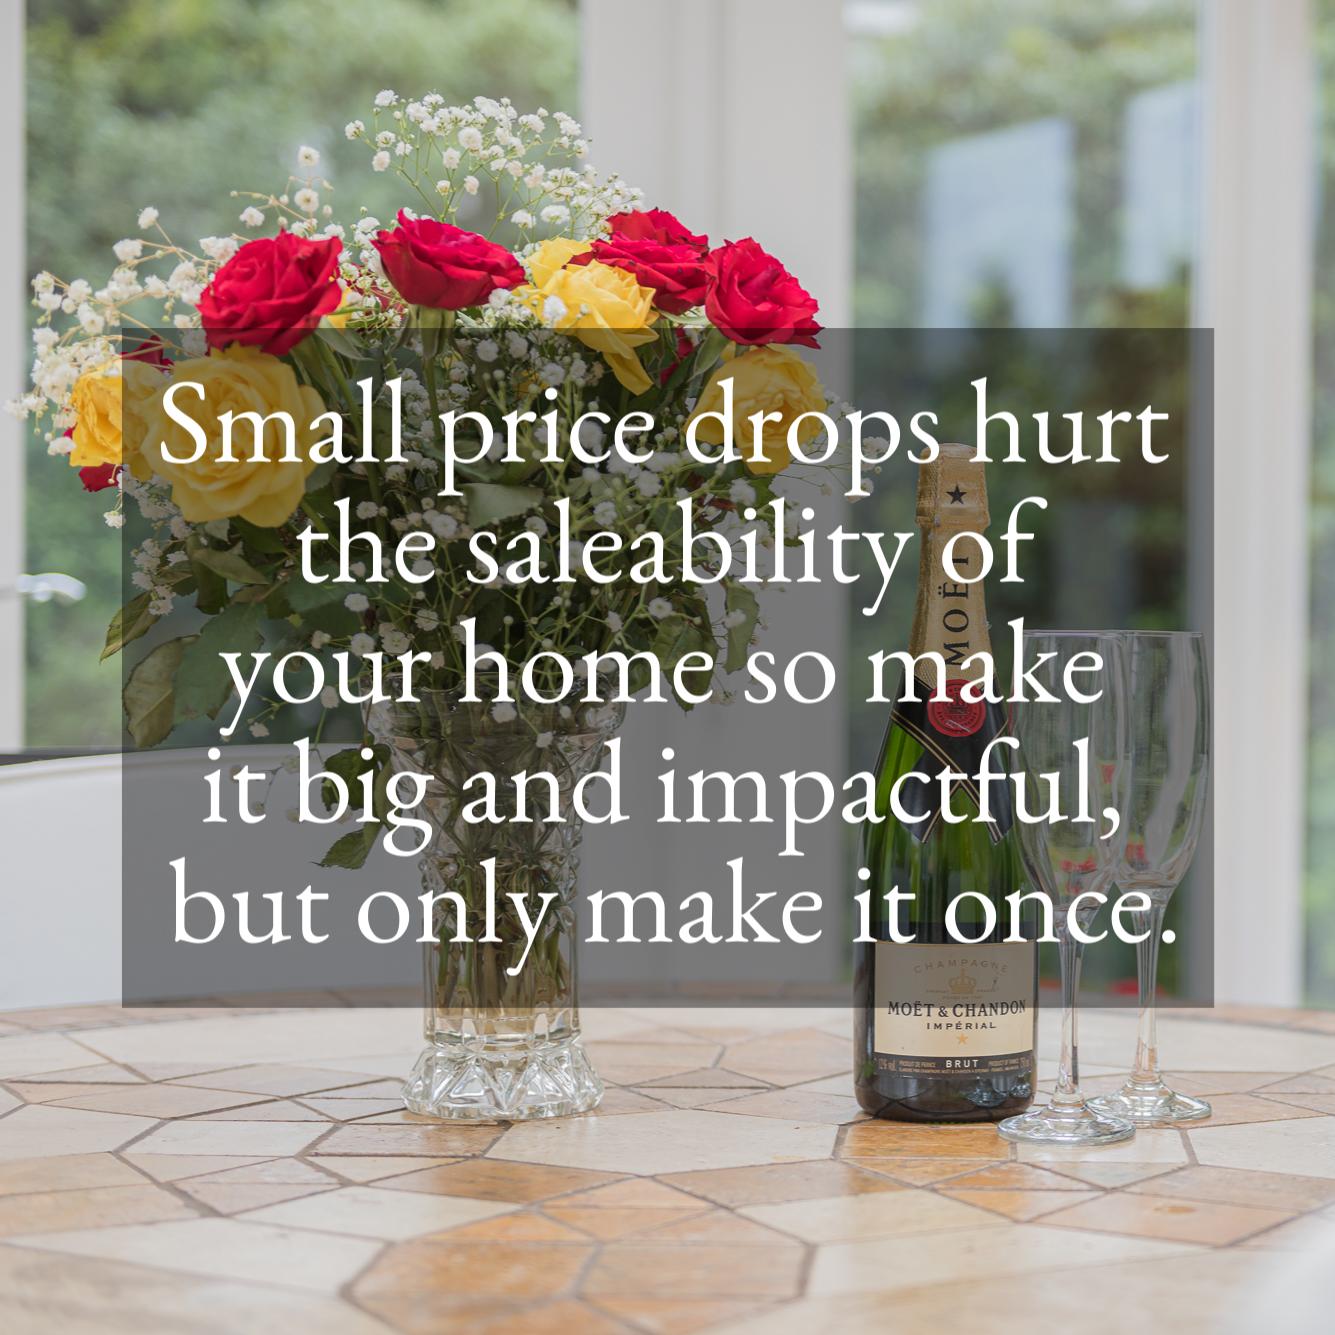 tg3-small-price-drops-hurt-the-saleability